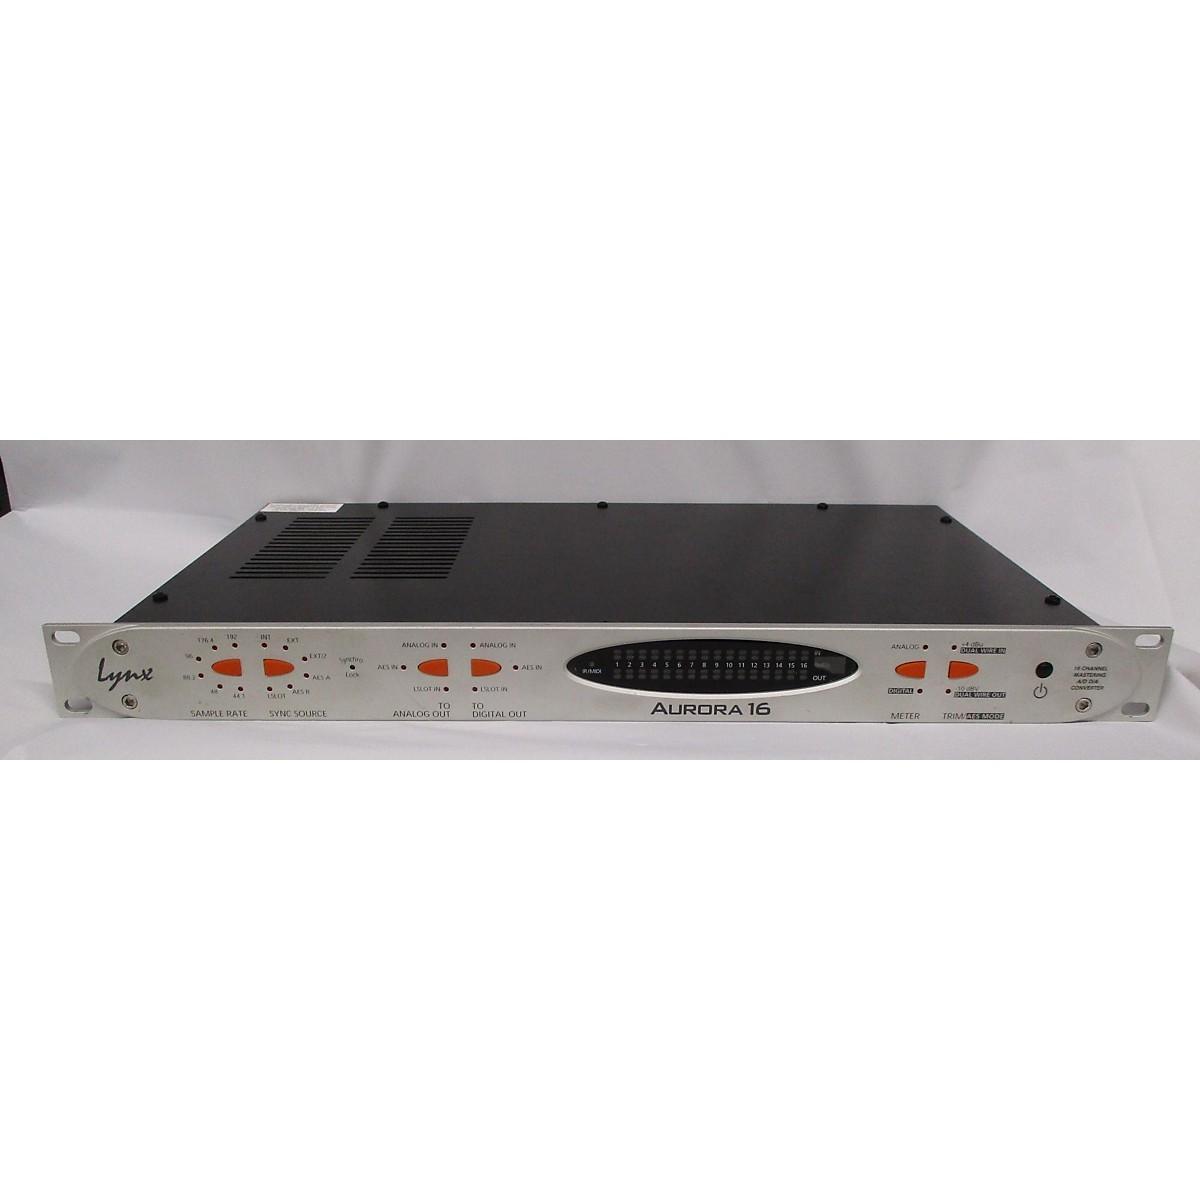 Lynx AURORA 16-vT HD CONVERTER W/ LTHD INSTALLED Audio Converter